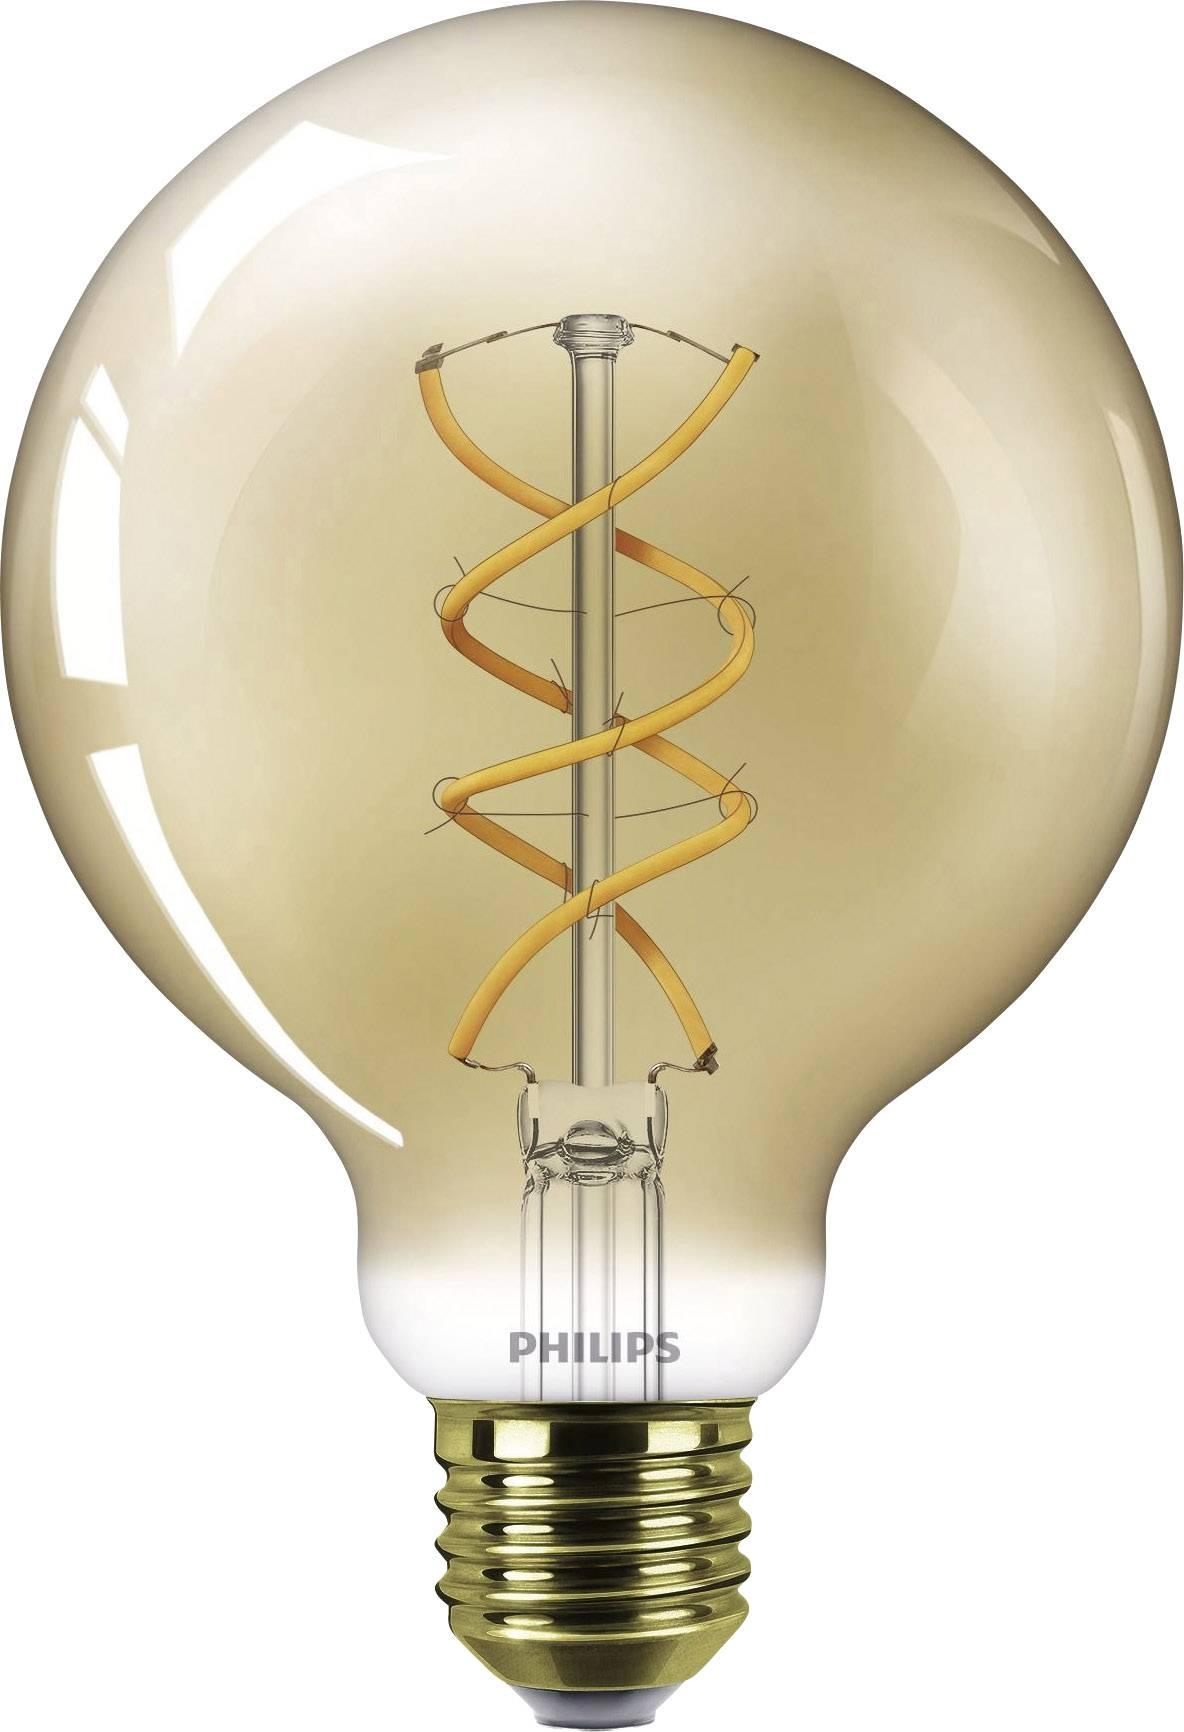 Philips Lampen Kopen : ▷ led lamp e flame kopen online internetwinkel